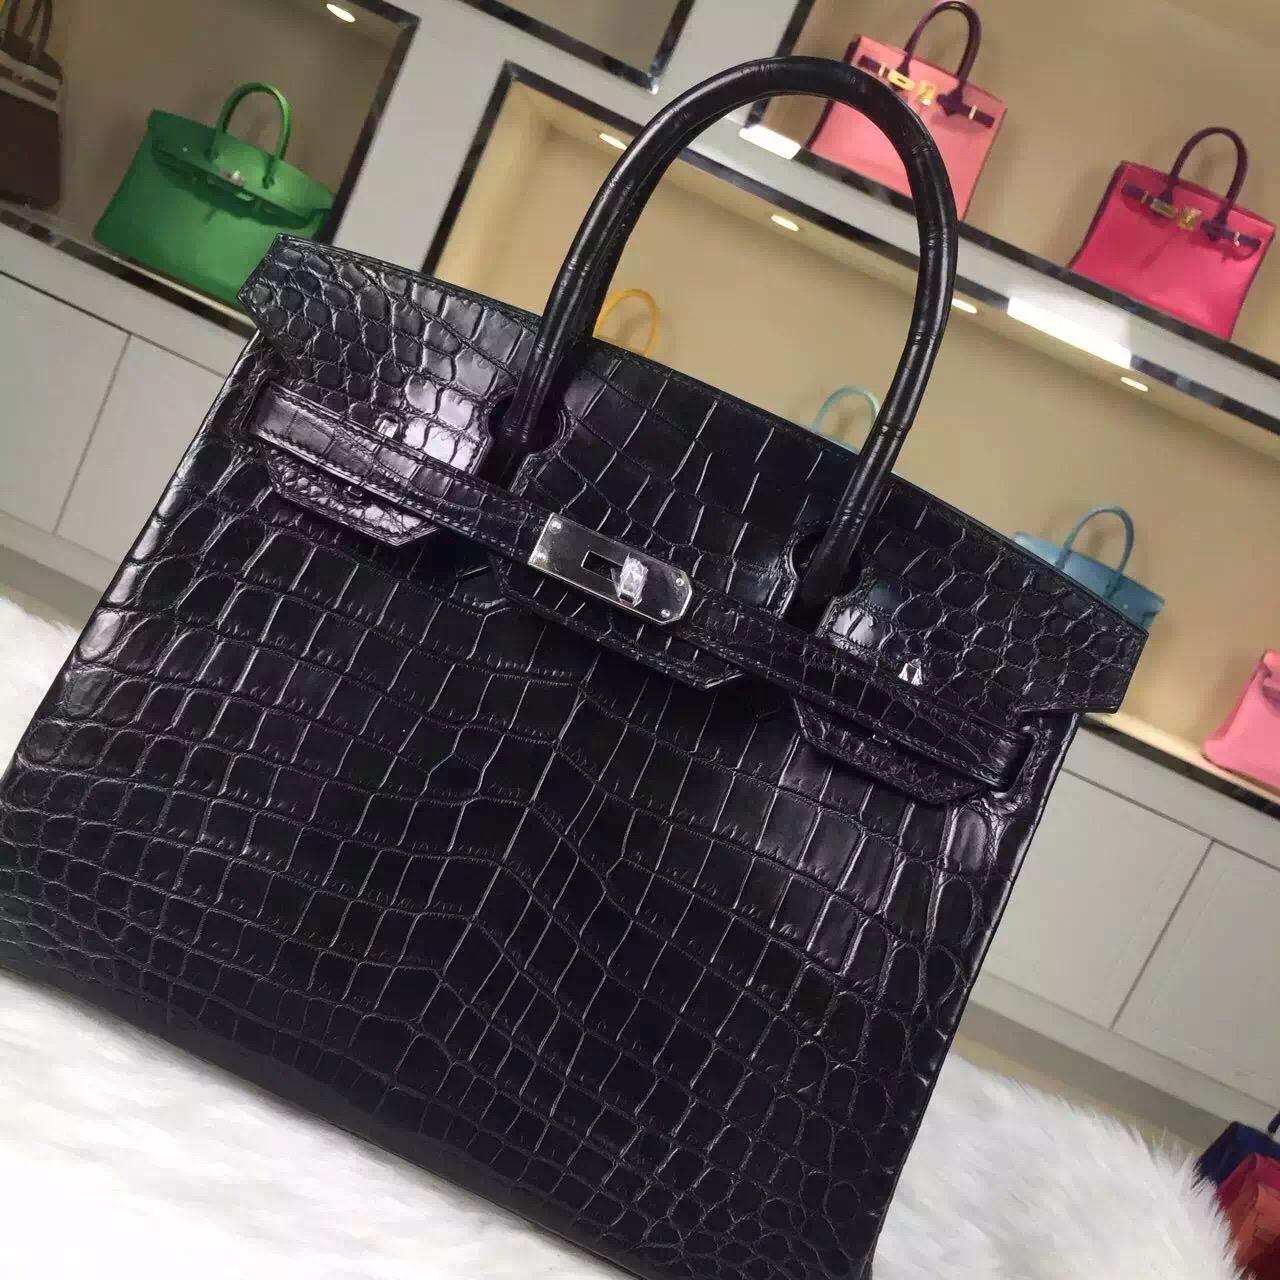 Discount Hermes Crocodile Leather Birkin Bag 30CM in CK89 Black Silver Hardware